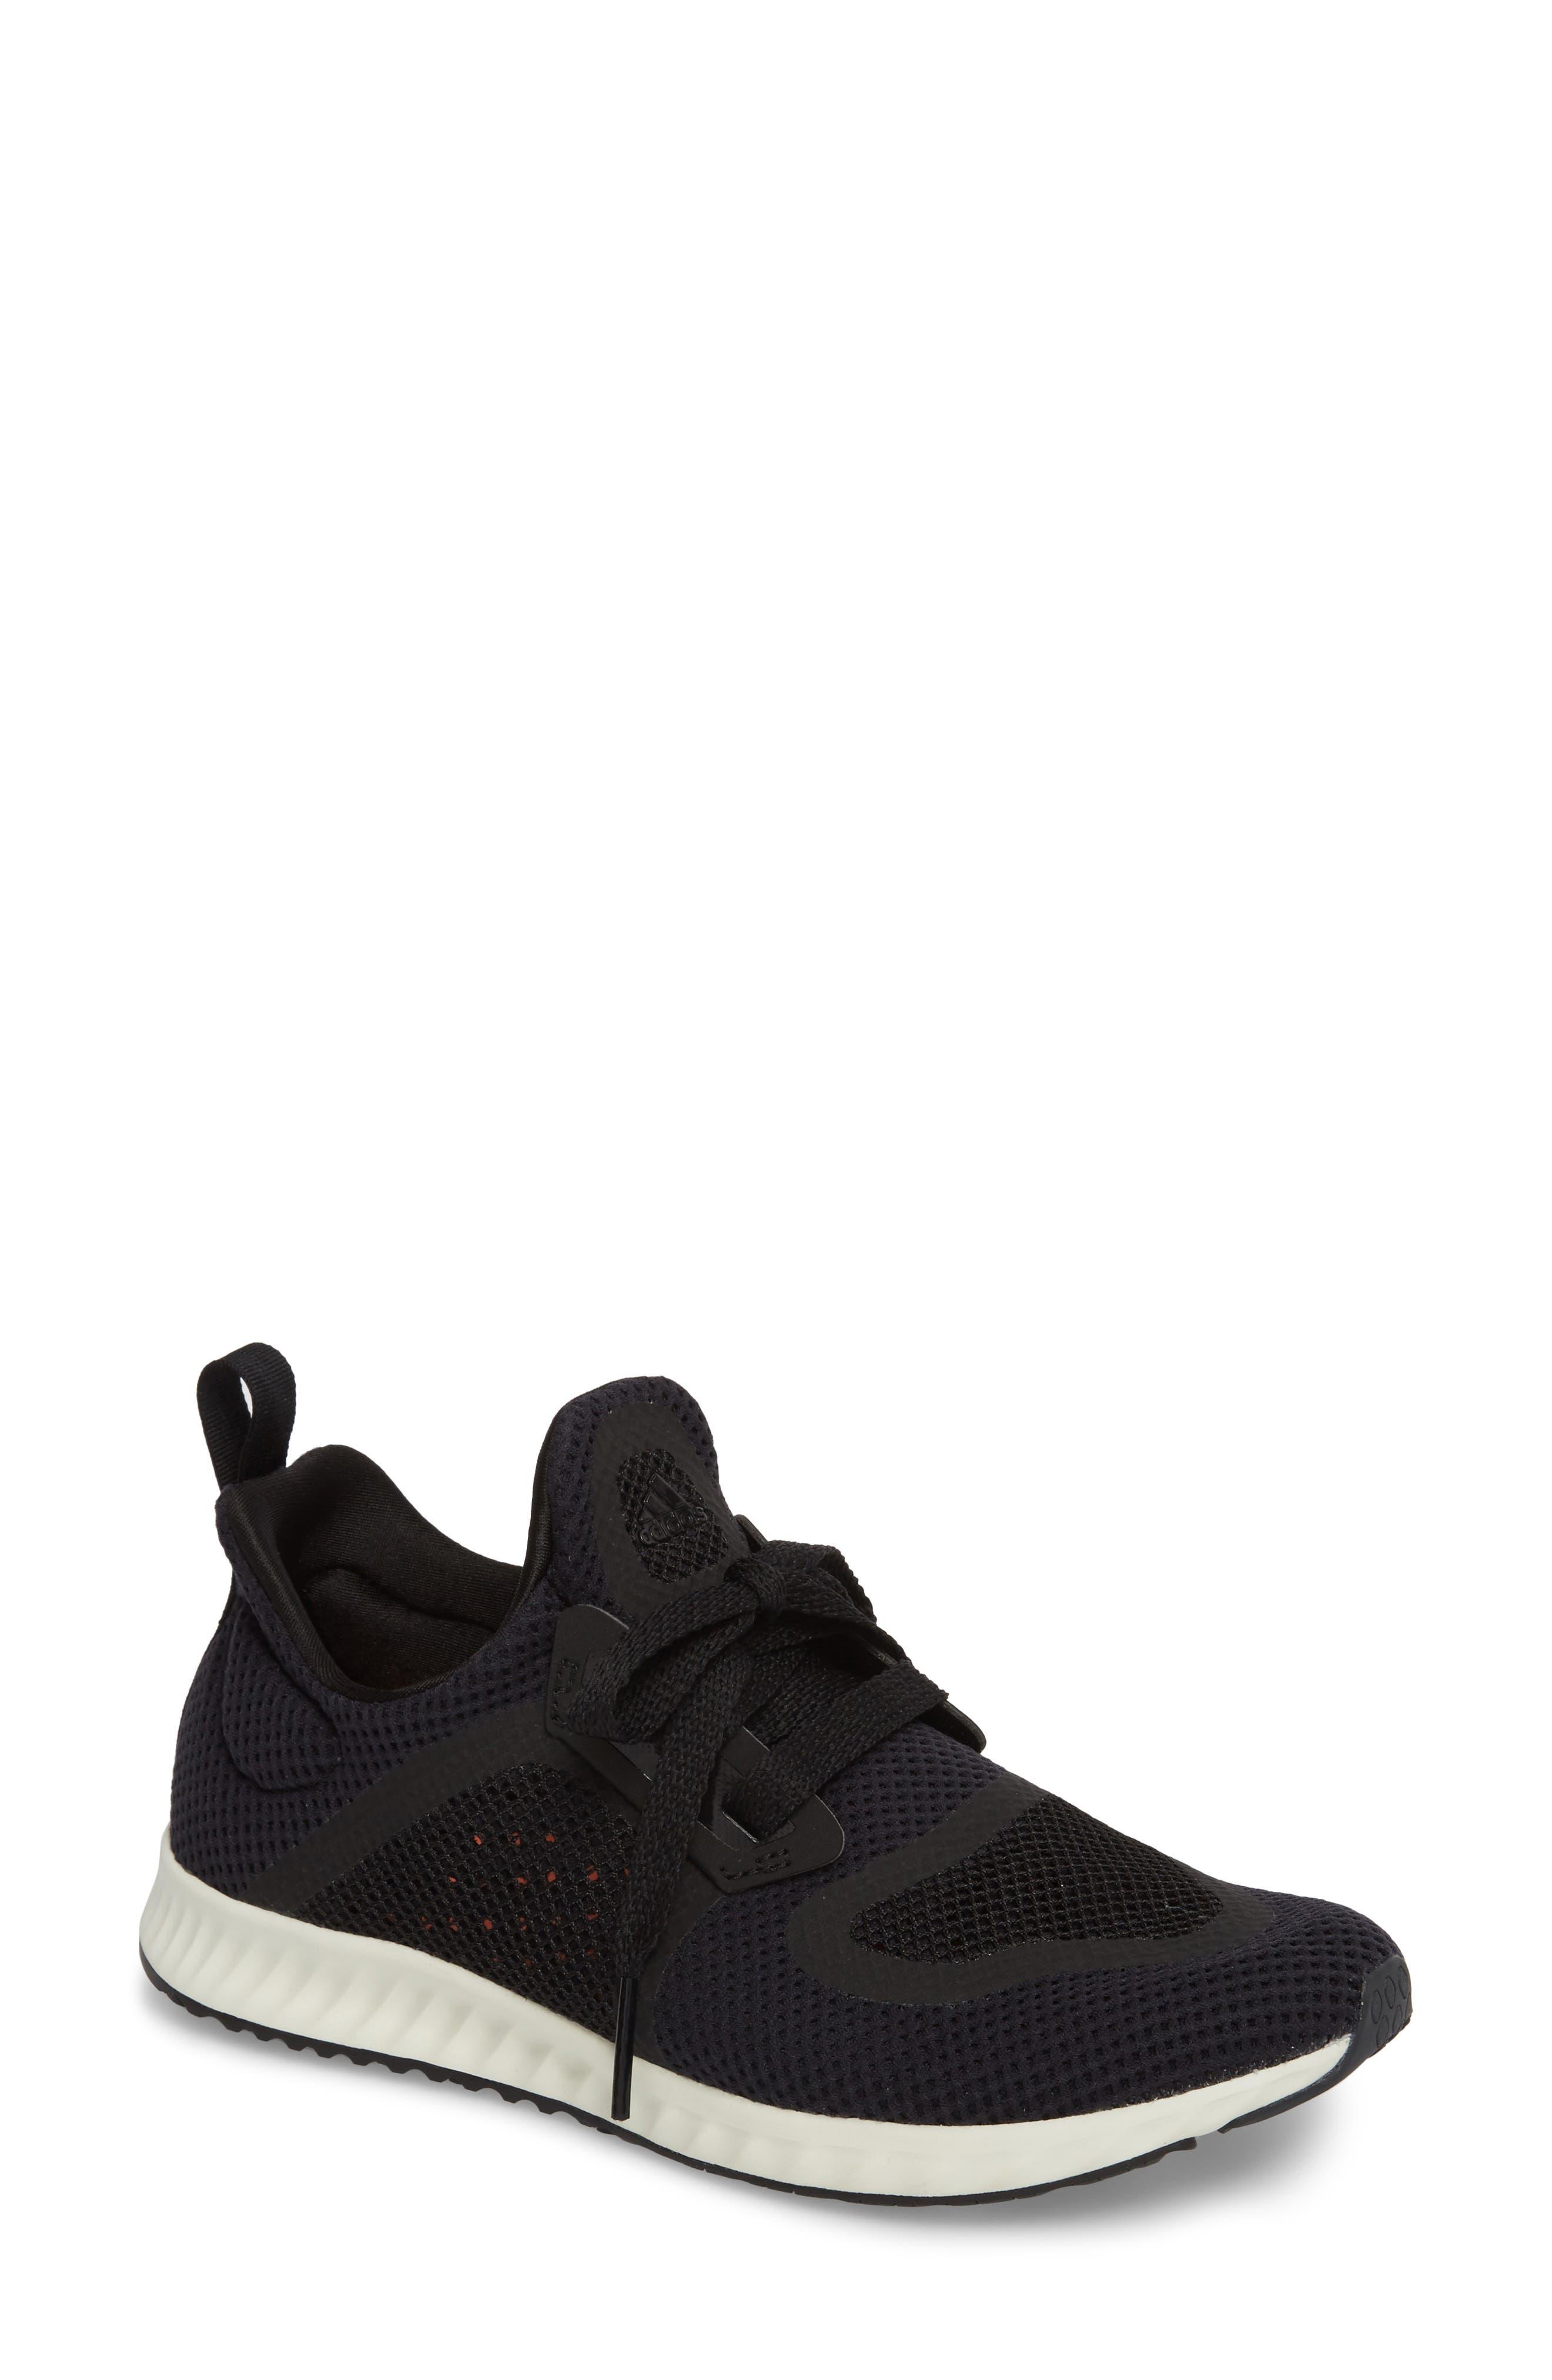 Main Image - adidas Edge Lux Clima Running Shoe (Women)